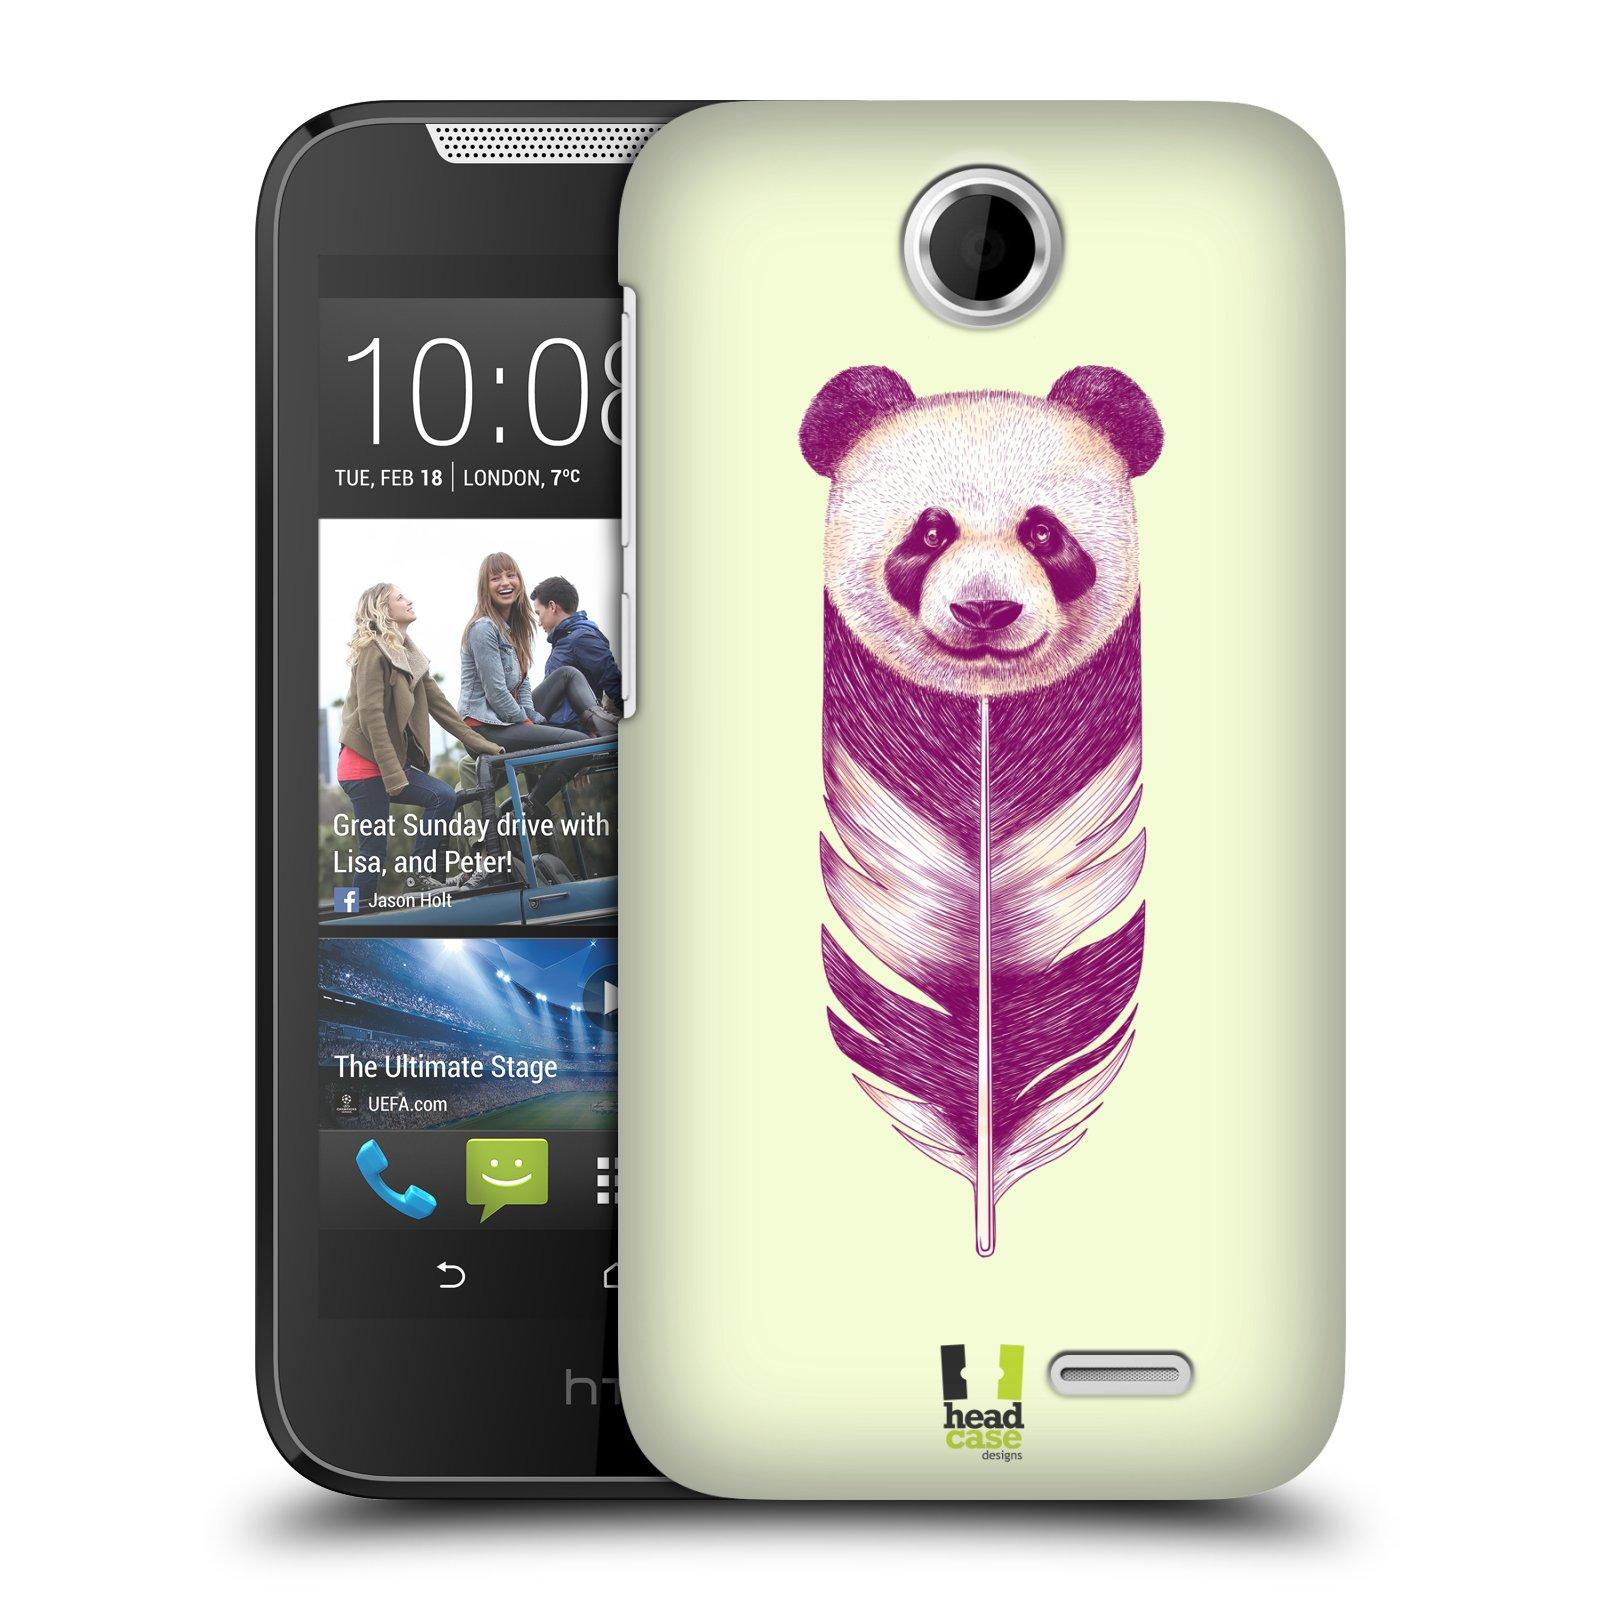 HEAD CASE plastový obal na mobil HTC Desire 310 vzor zvířecí pírka panda